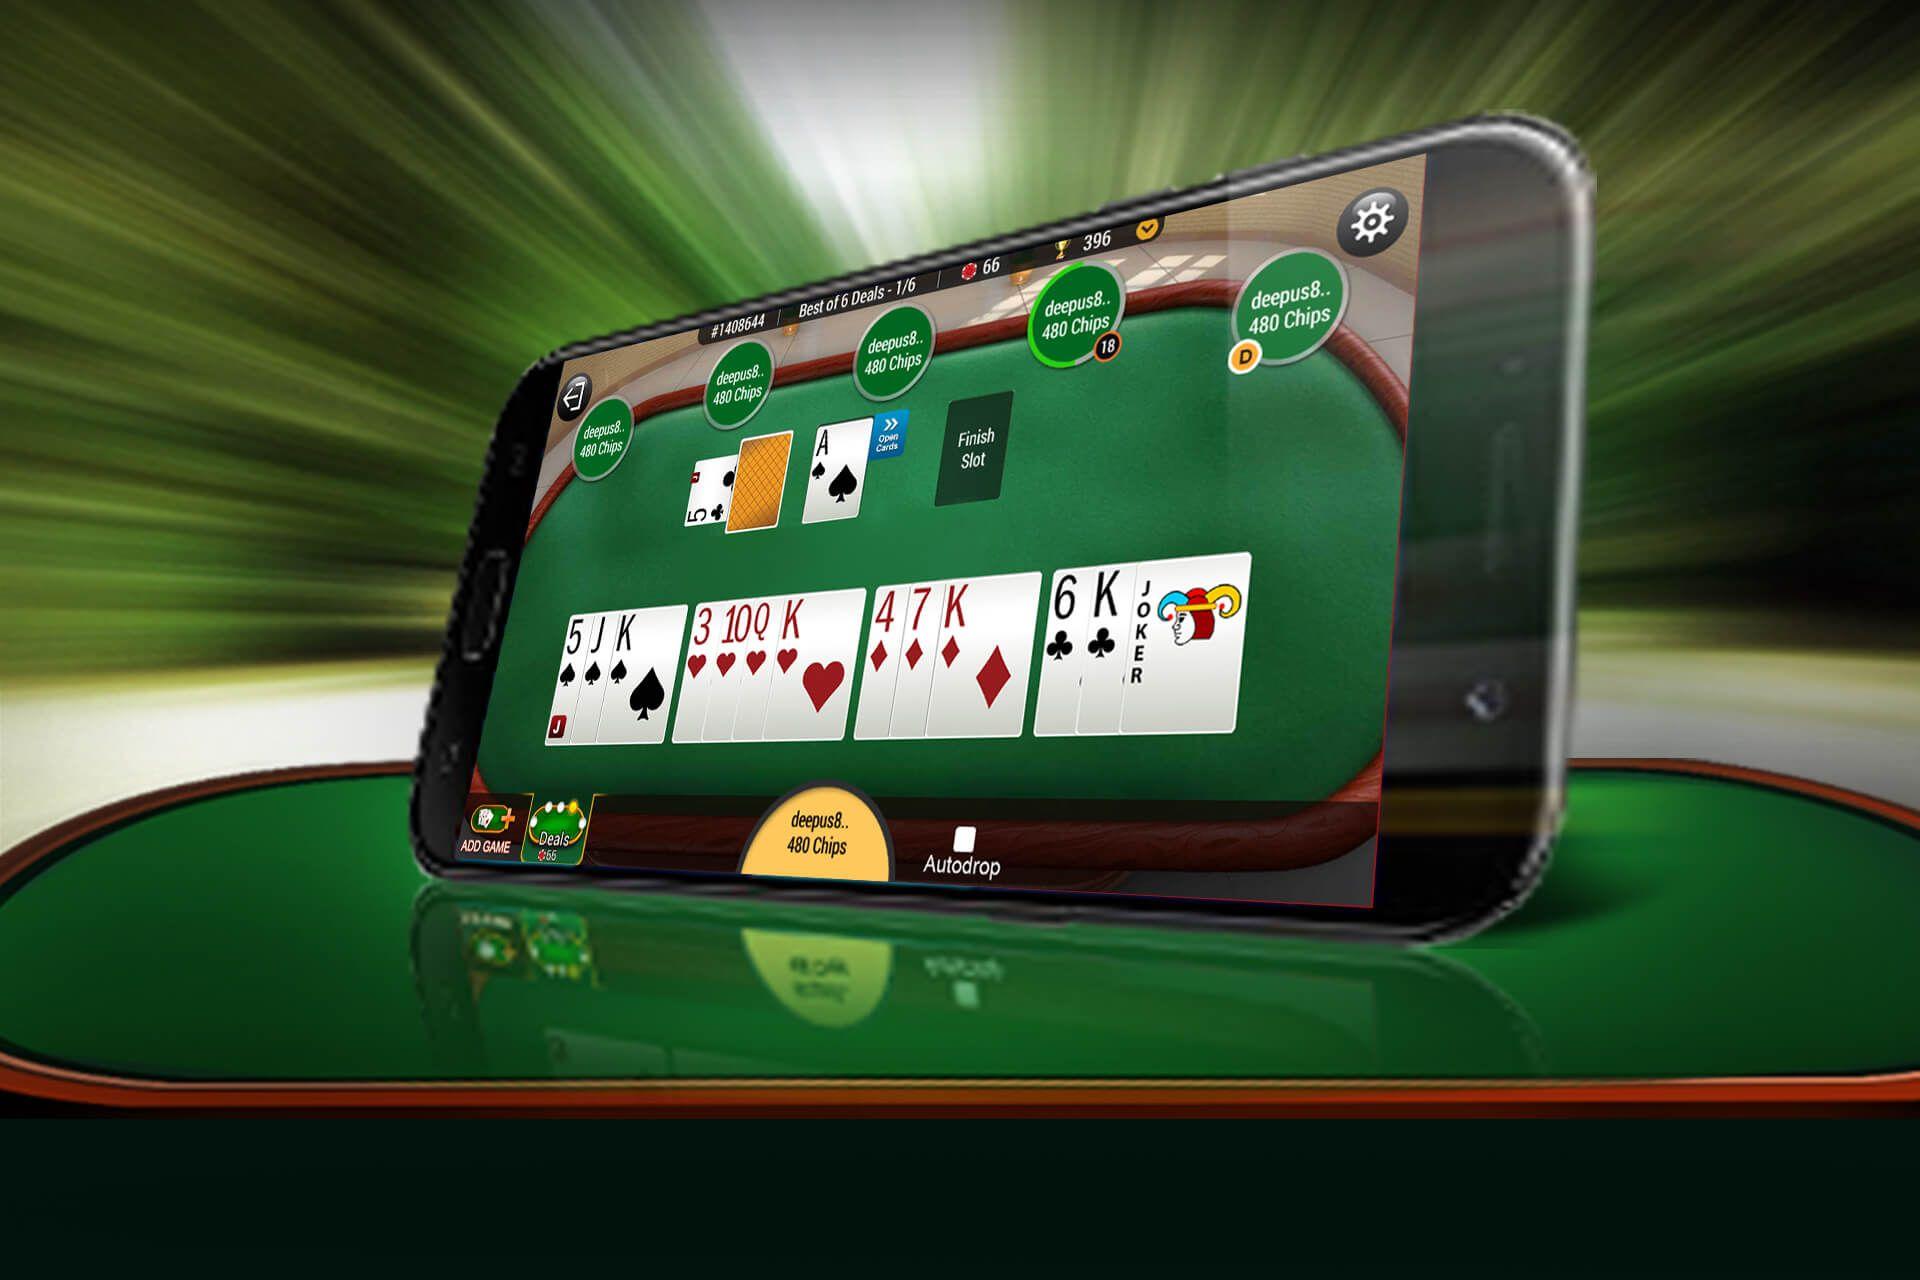 Download Silkrummy App Rummy game, Rummy, Game app